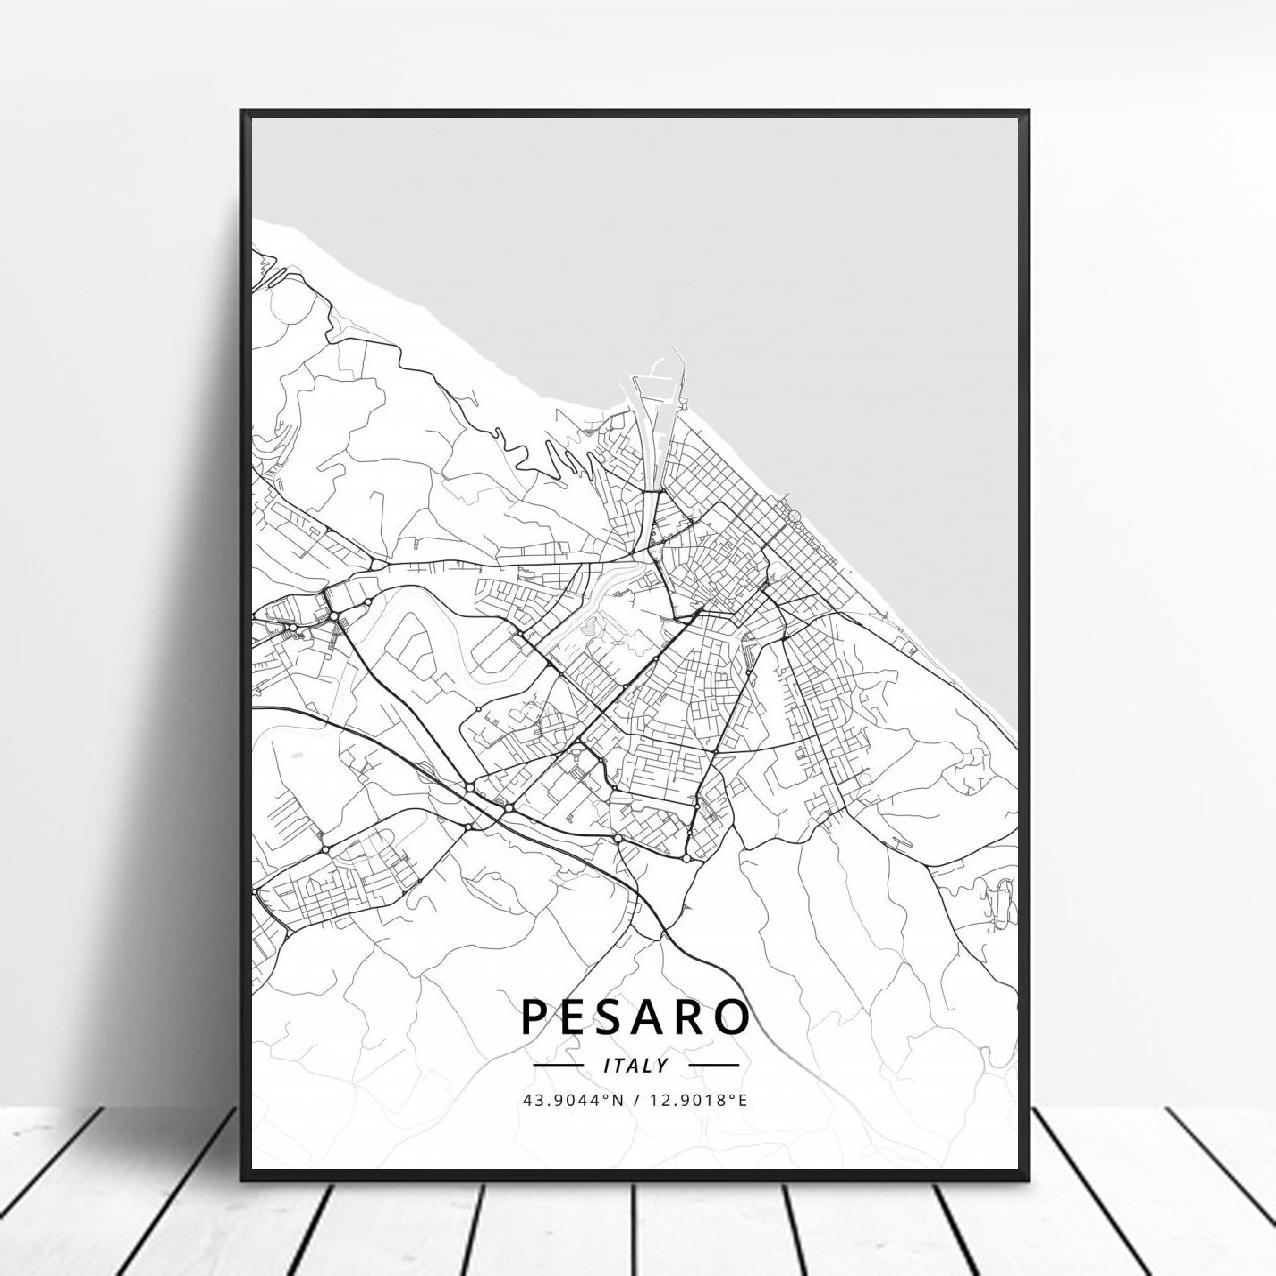 Póster Artístico de Pesaro Messina, mapa de Florencia, veneciana, Amalfi, Brescia, Italia